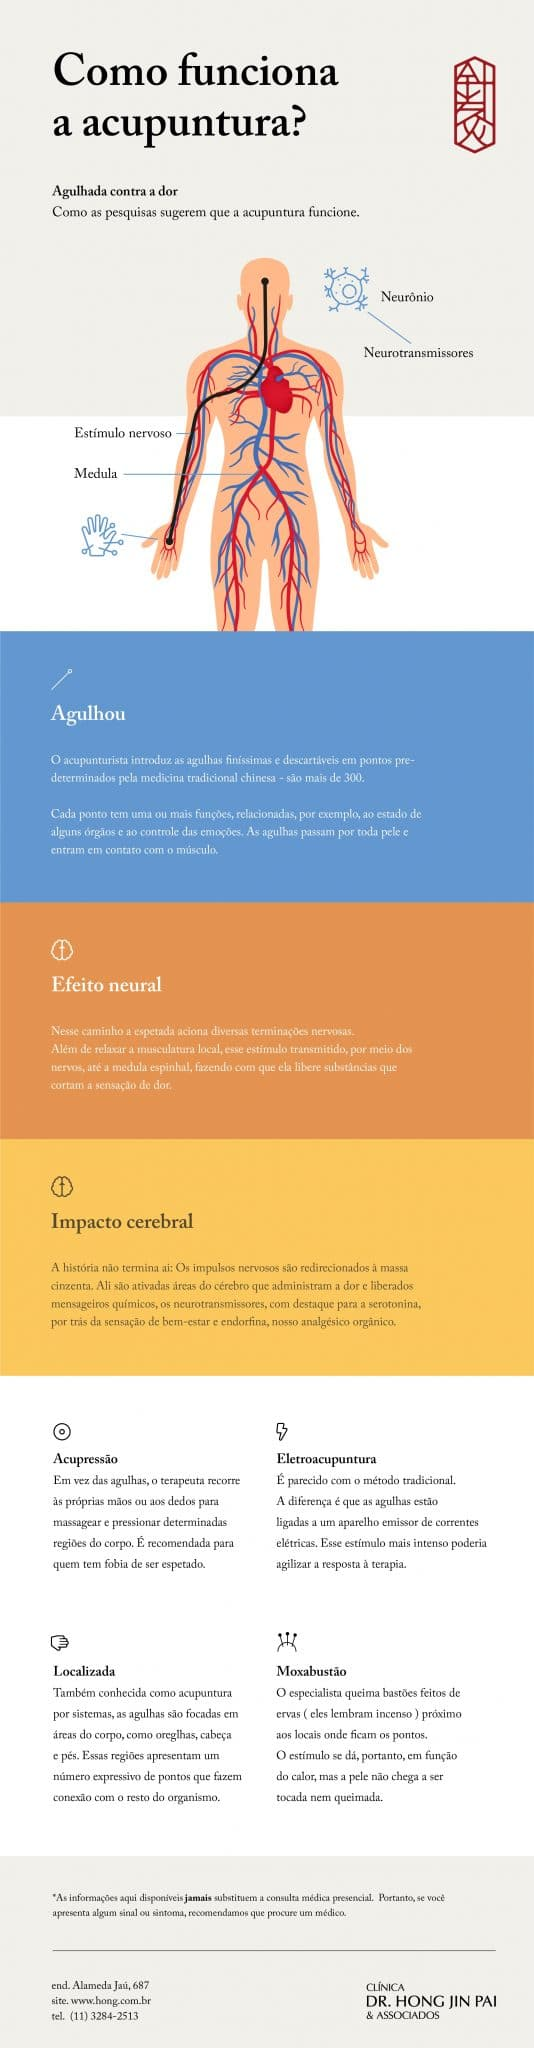 Infografico sobre Acupuntura